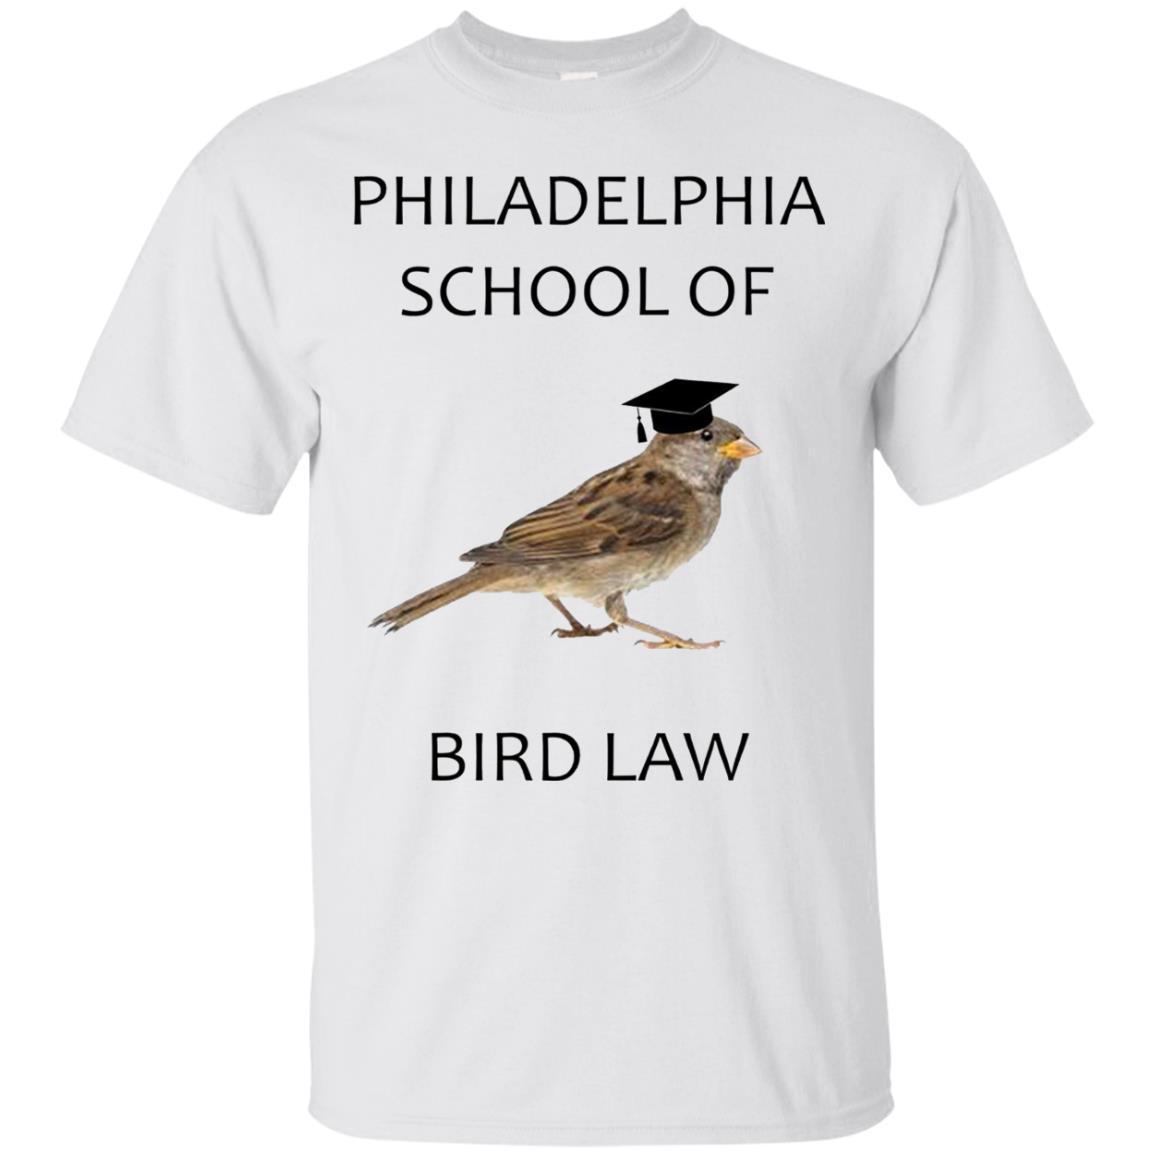 Philadelphia School of Bird Law Sunny Funny T-Shirt